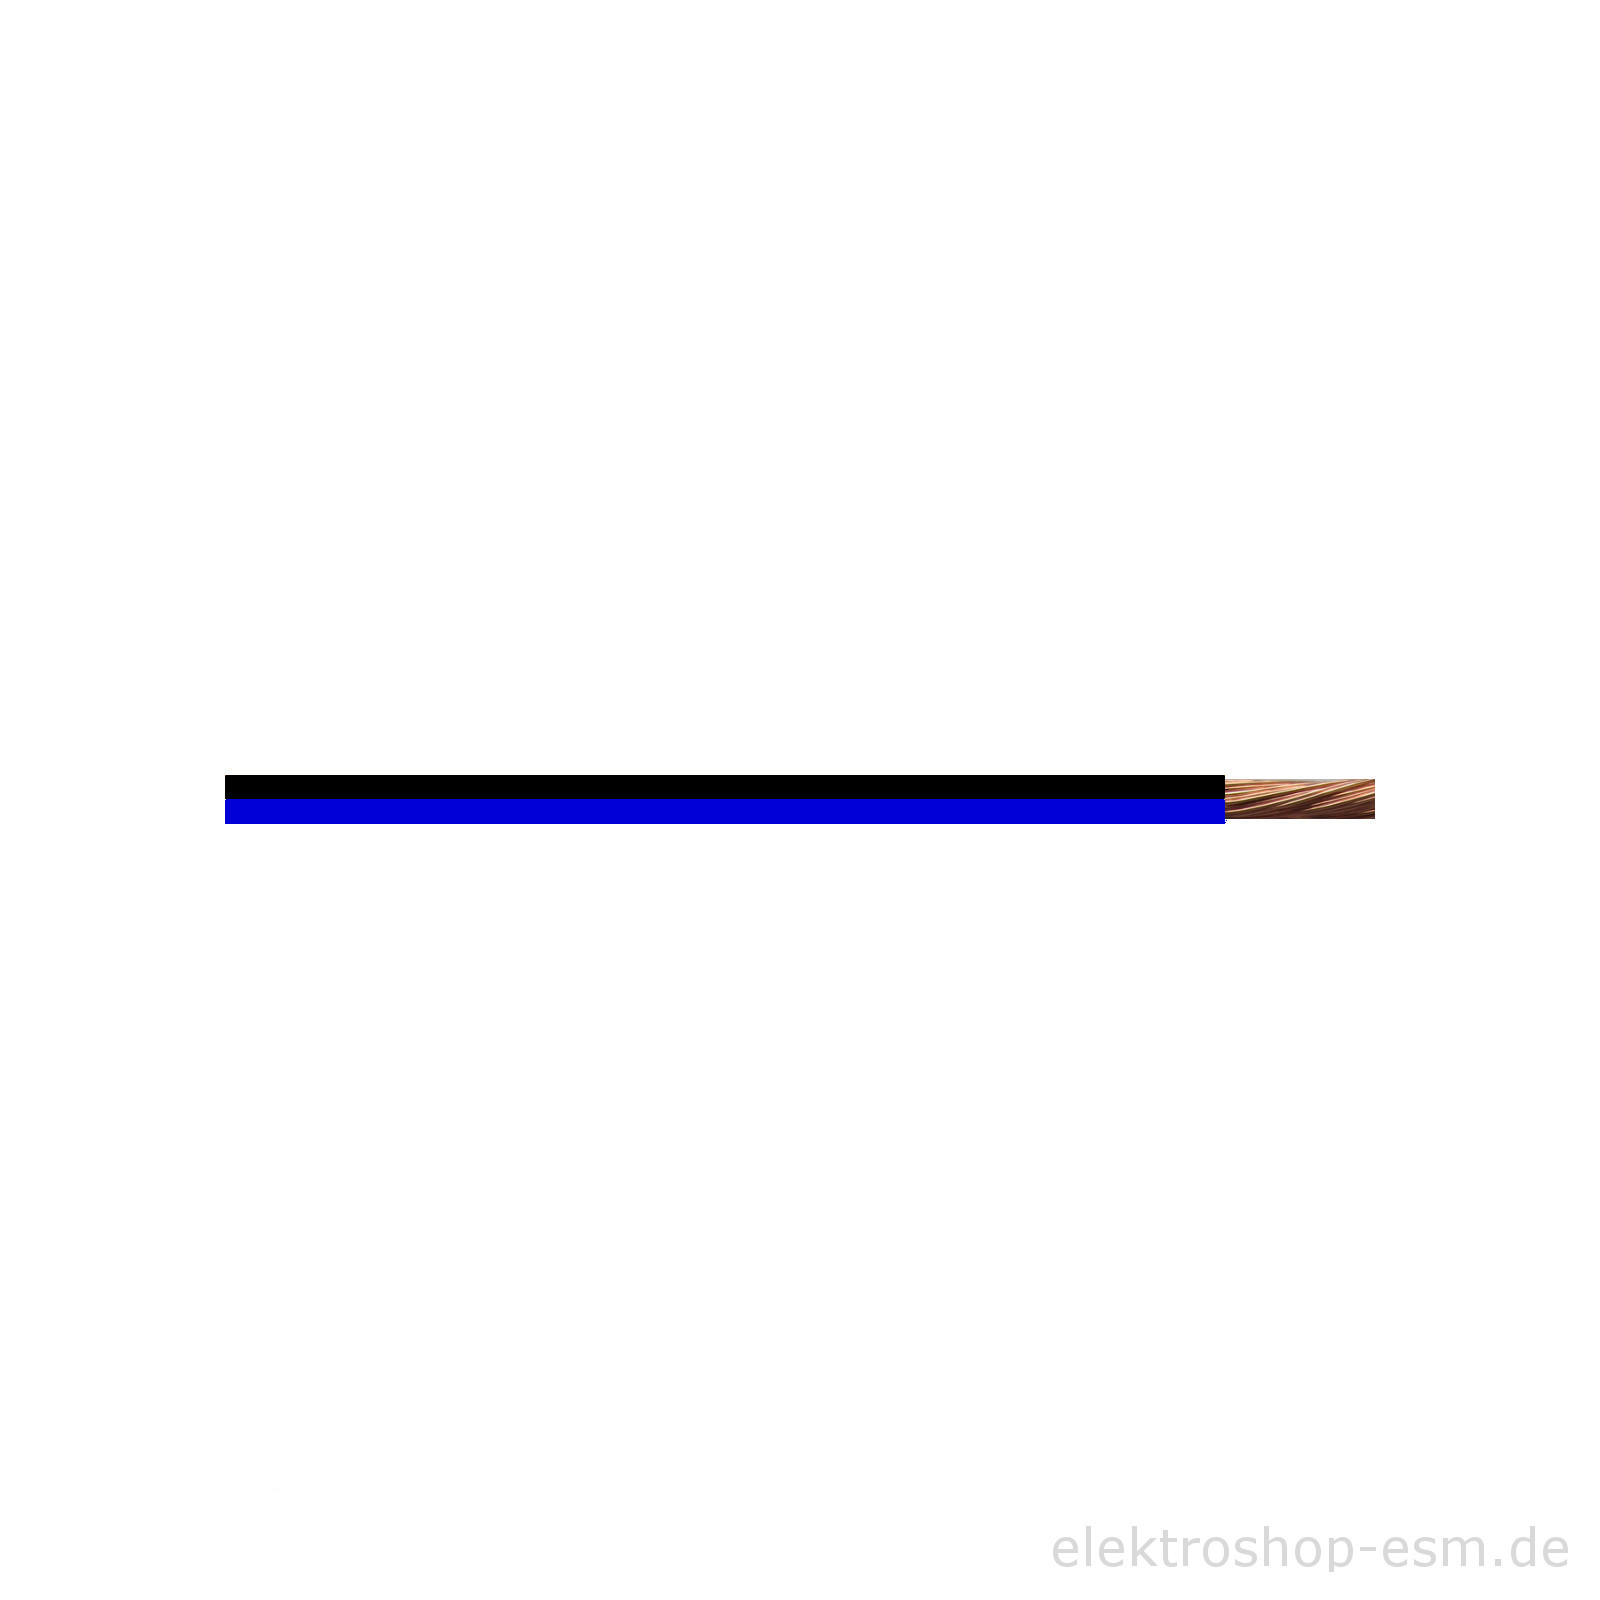 1 00 m fahrzeugleitung flry kfz elektrik litze kabel 0 75mm 39 farben ebay. Black Bedroom Furniture Sets. Home Design Ideas